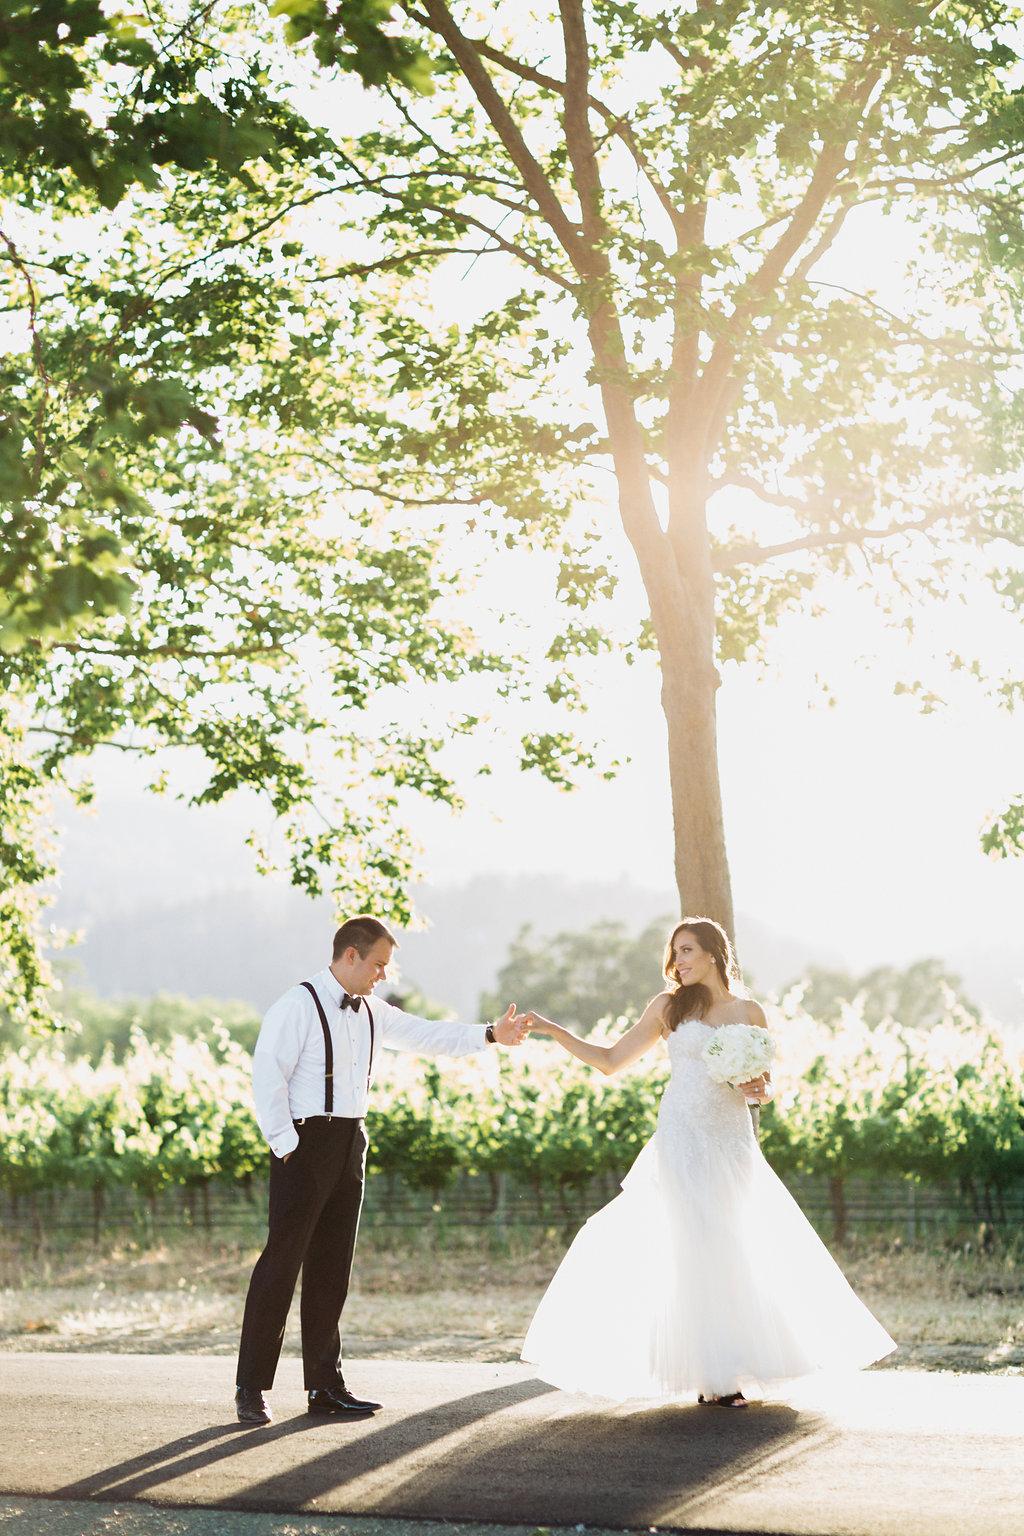 Beaulieu Garden, Napa wedding, wine country wedding